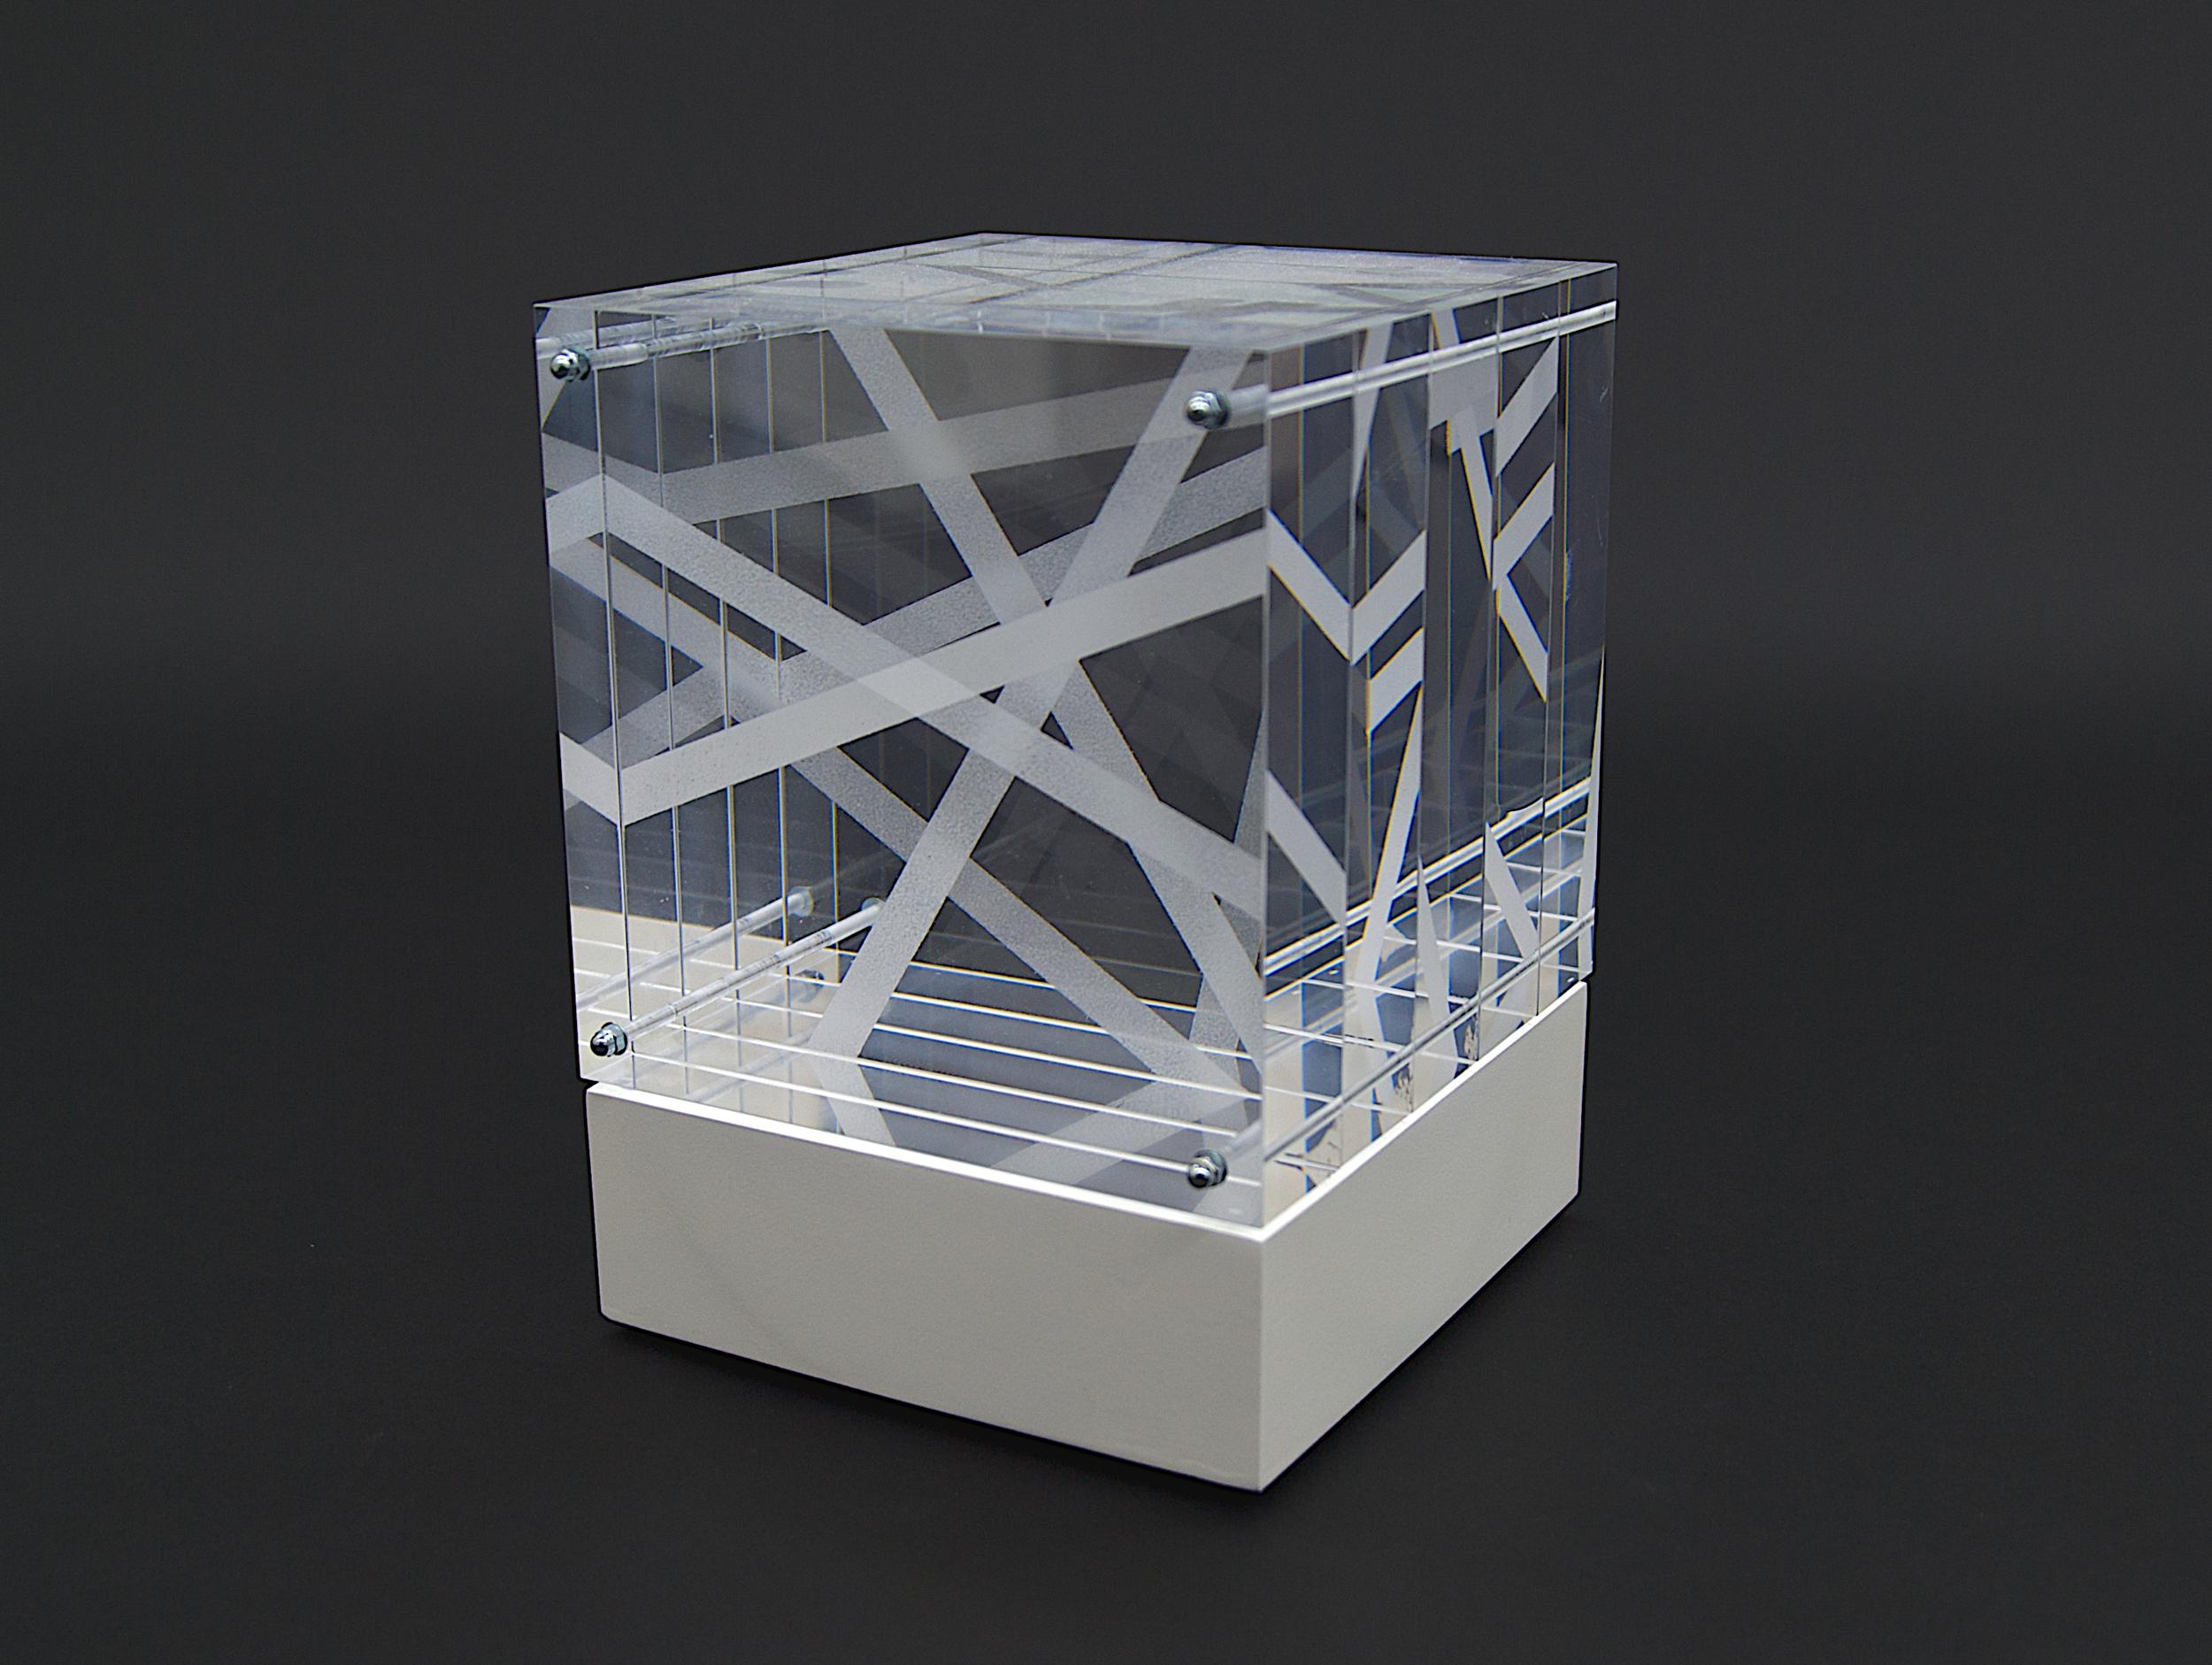 objekt nr. 05/2011- acrylglas bemalt - 15 x 15 x 15 cmauf drehbarem sockel